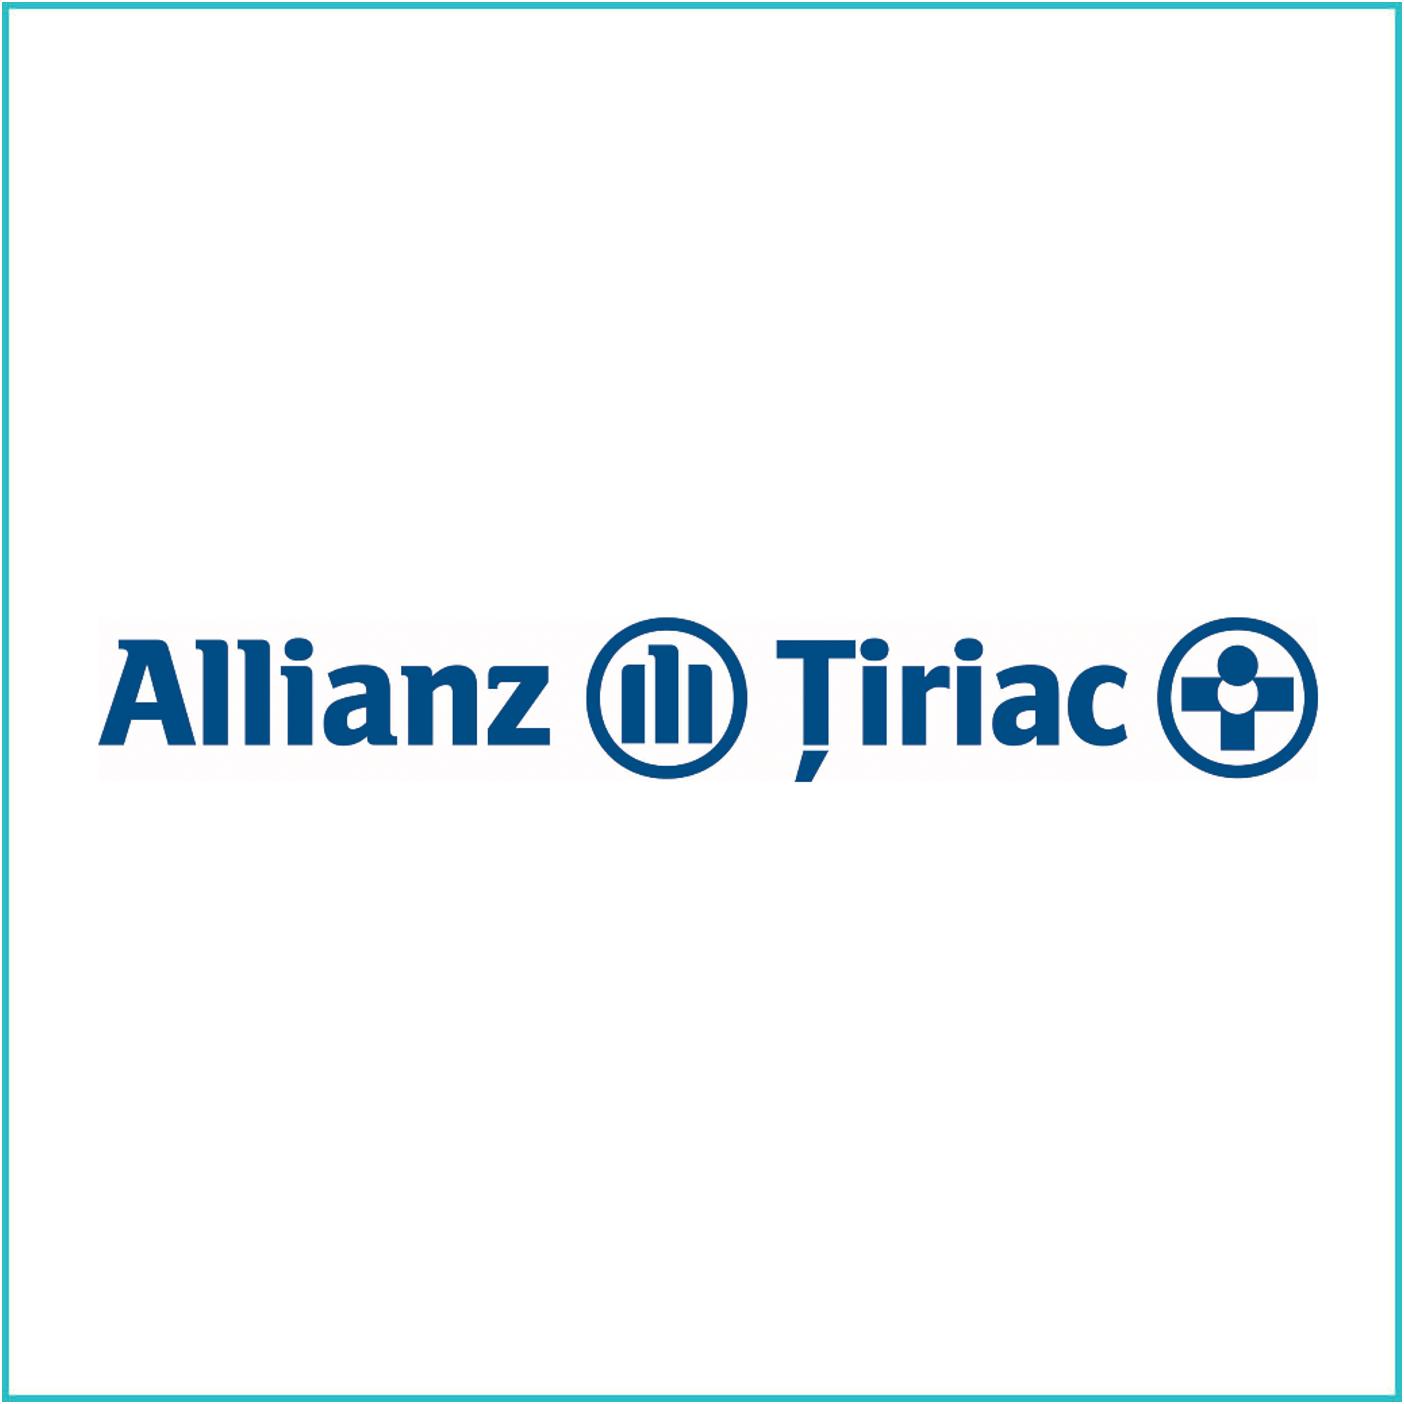 Companii de asigurari partenere - Allianz Tiriac // Artro Sport Clinic